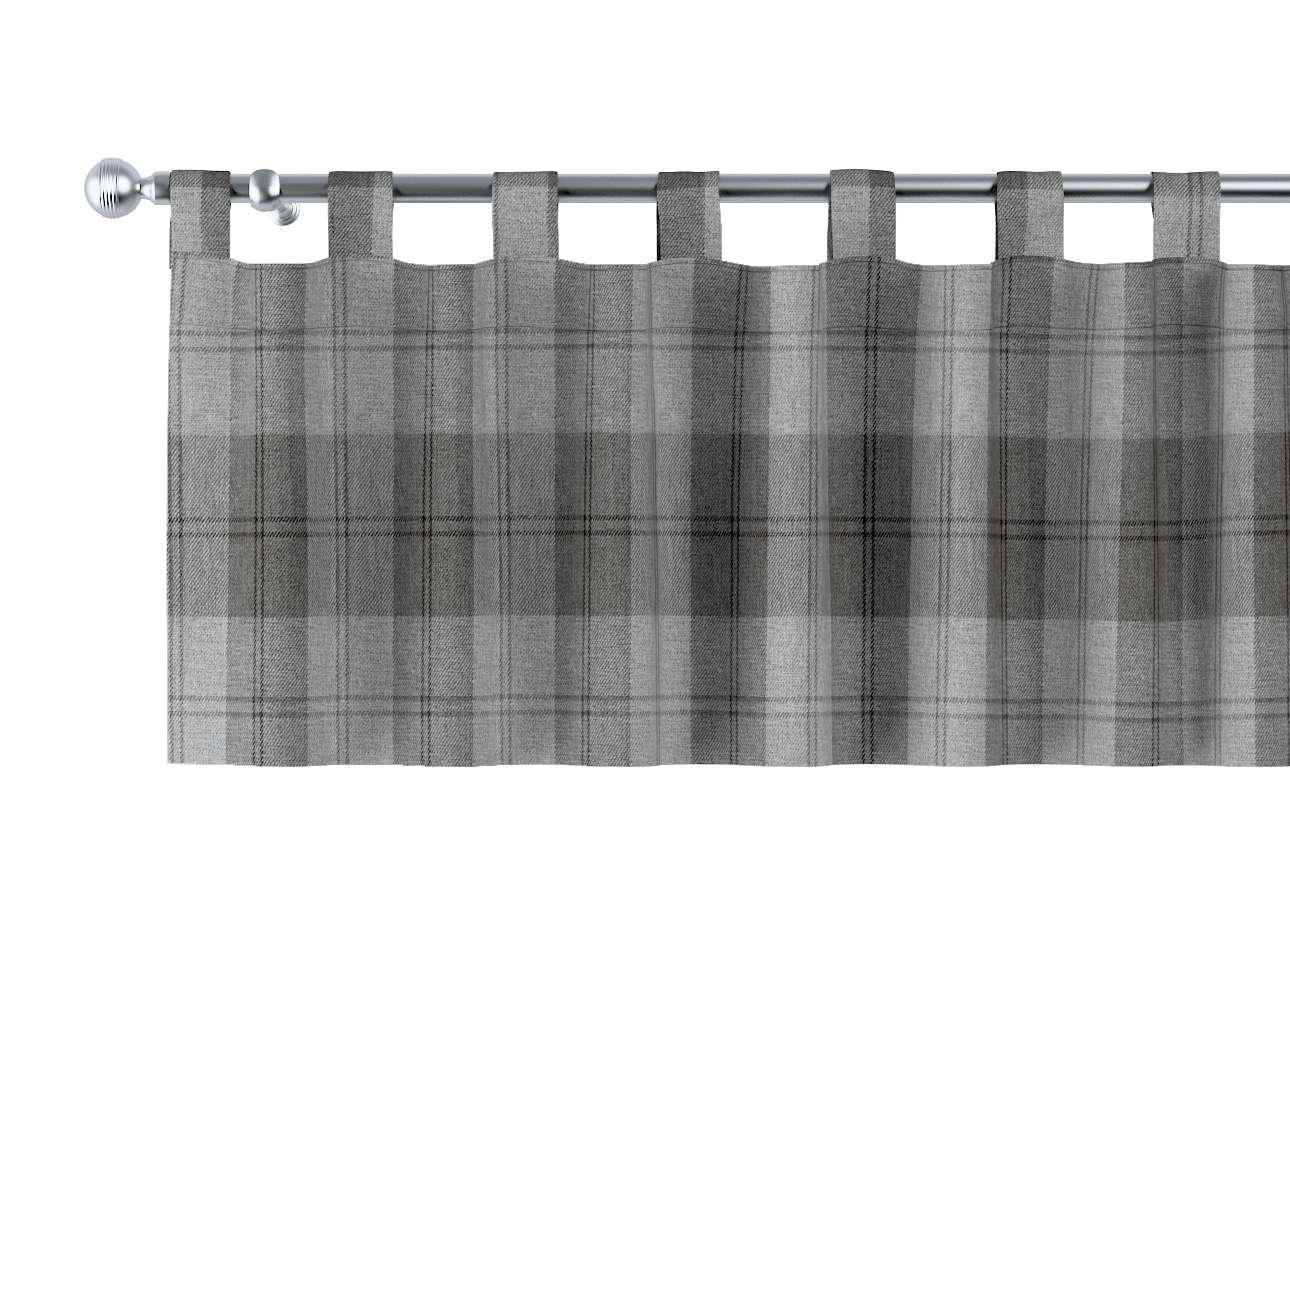 Lambrekin na szelkach w kolekcji Edinburgh, tkanina: 115-75